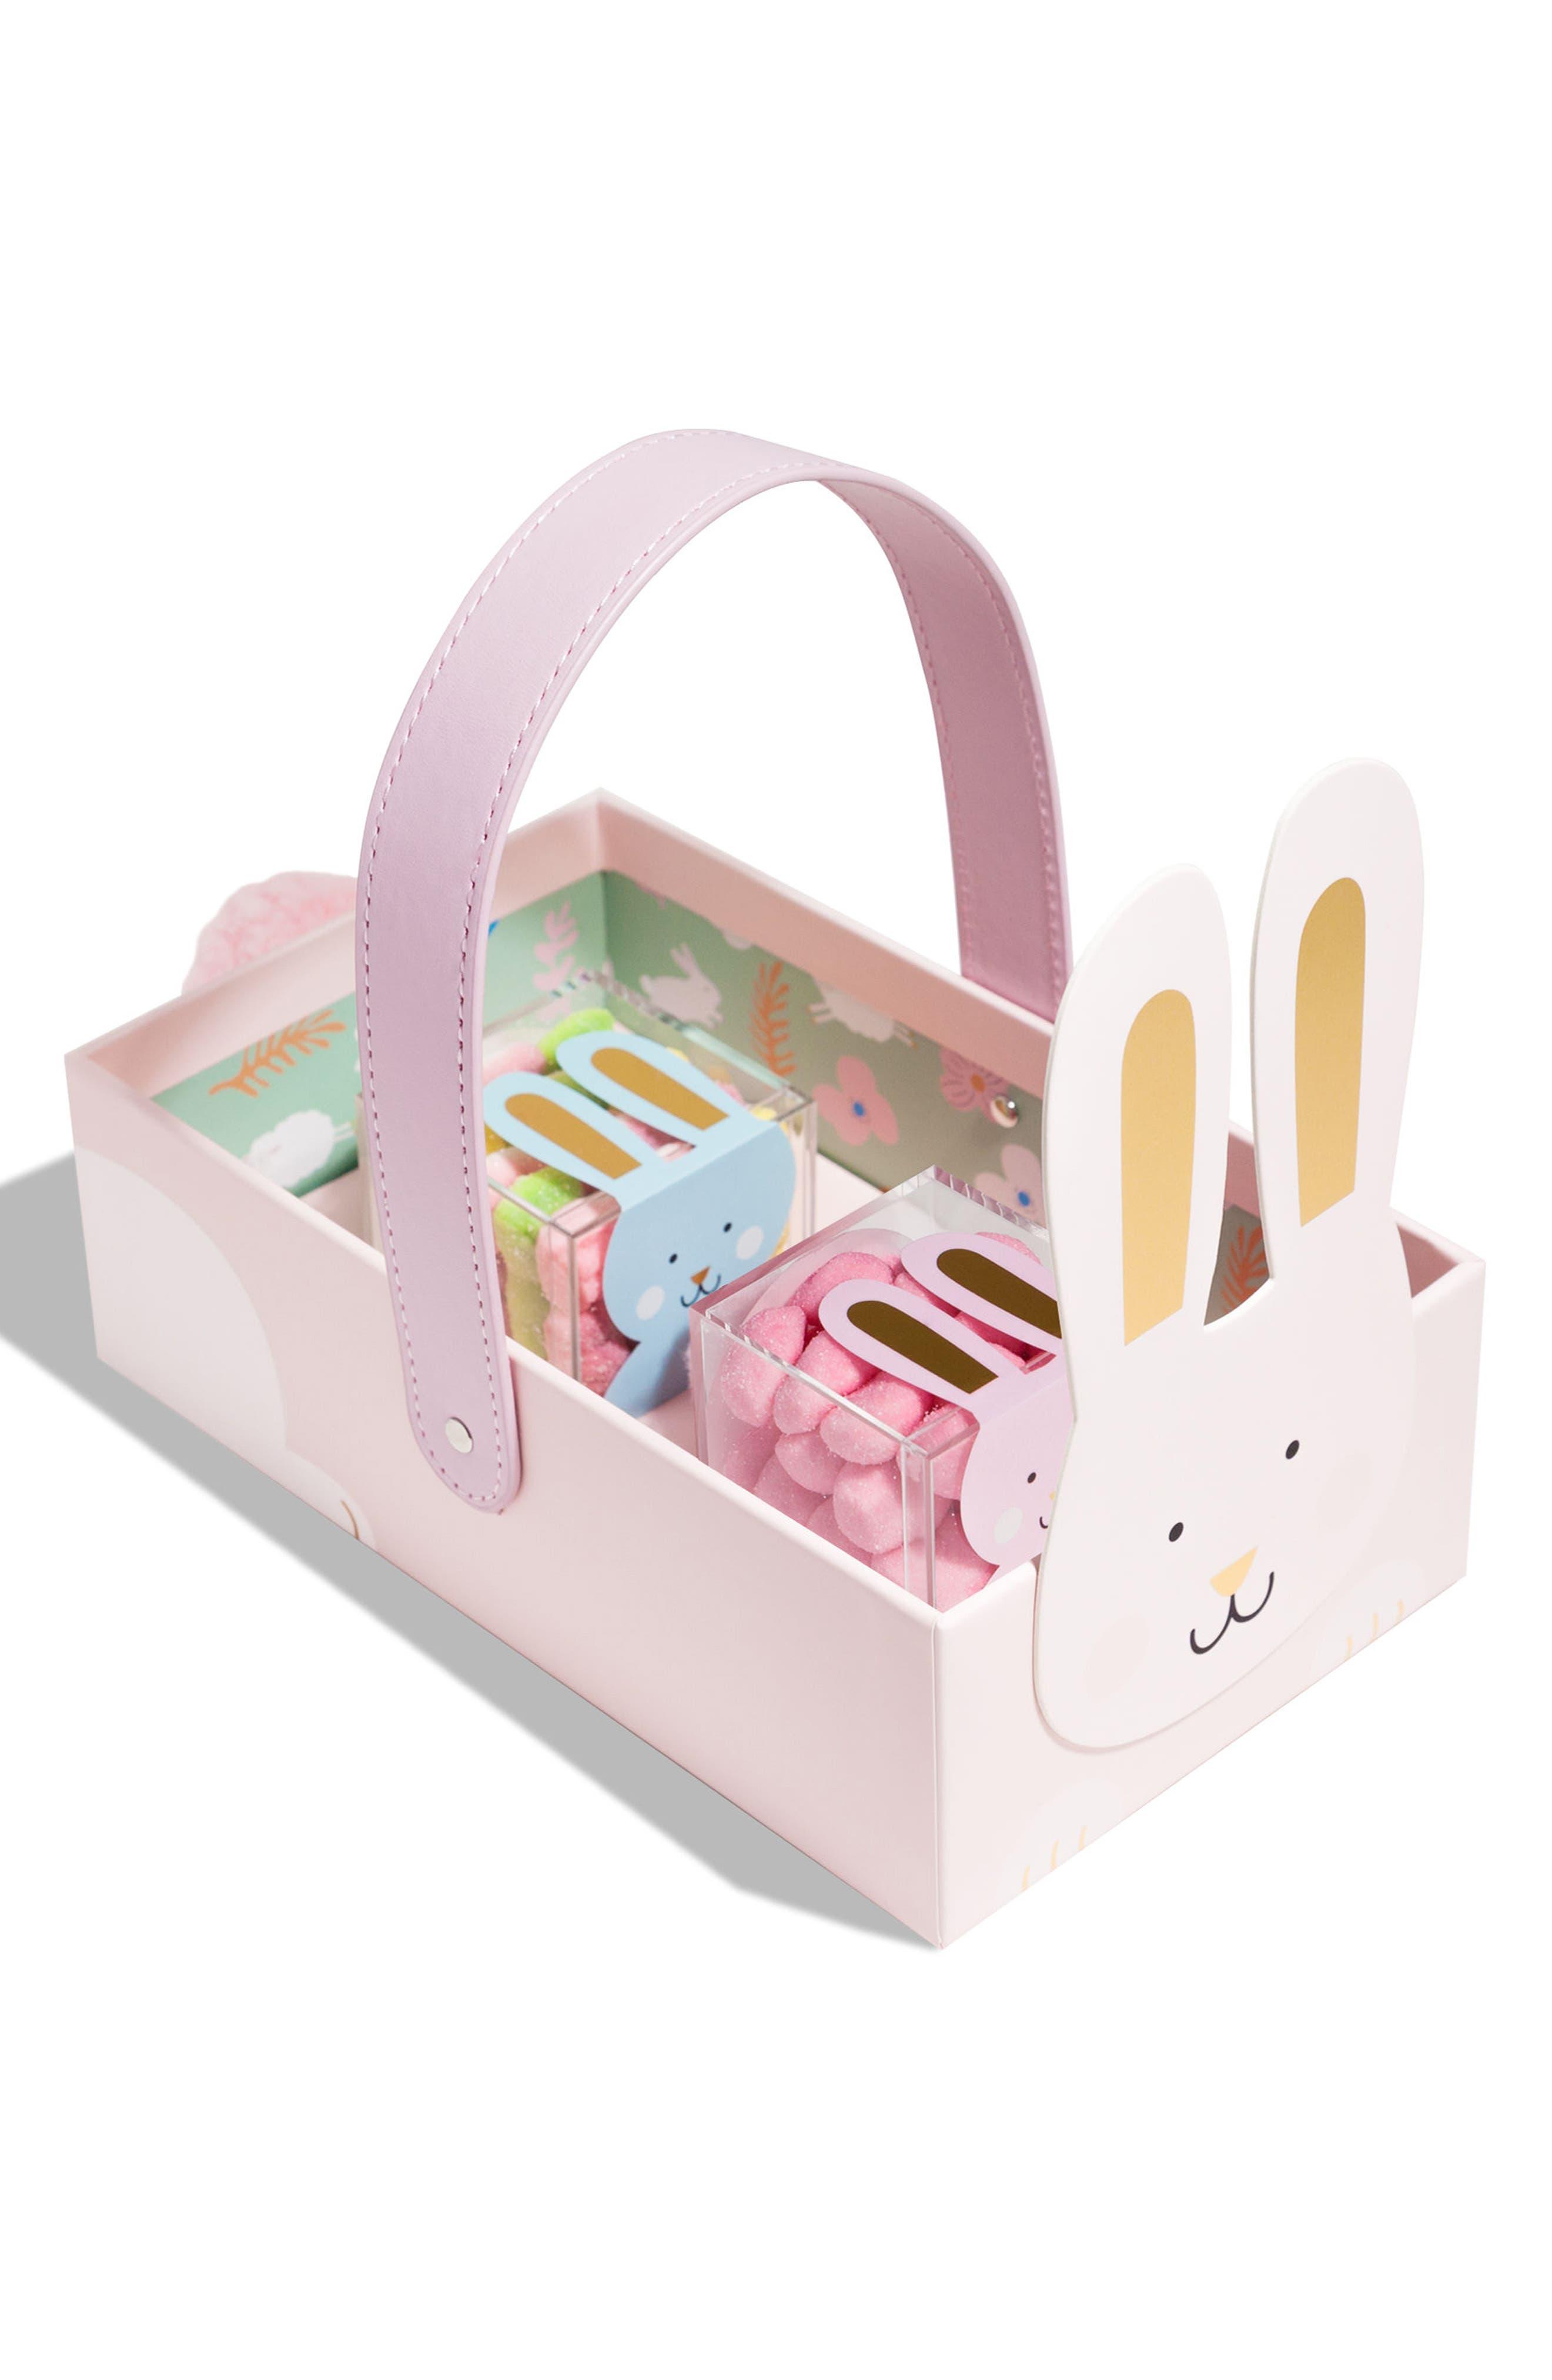 sugarfina Bunny Basket 3-Piece Gift Set